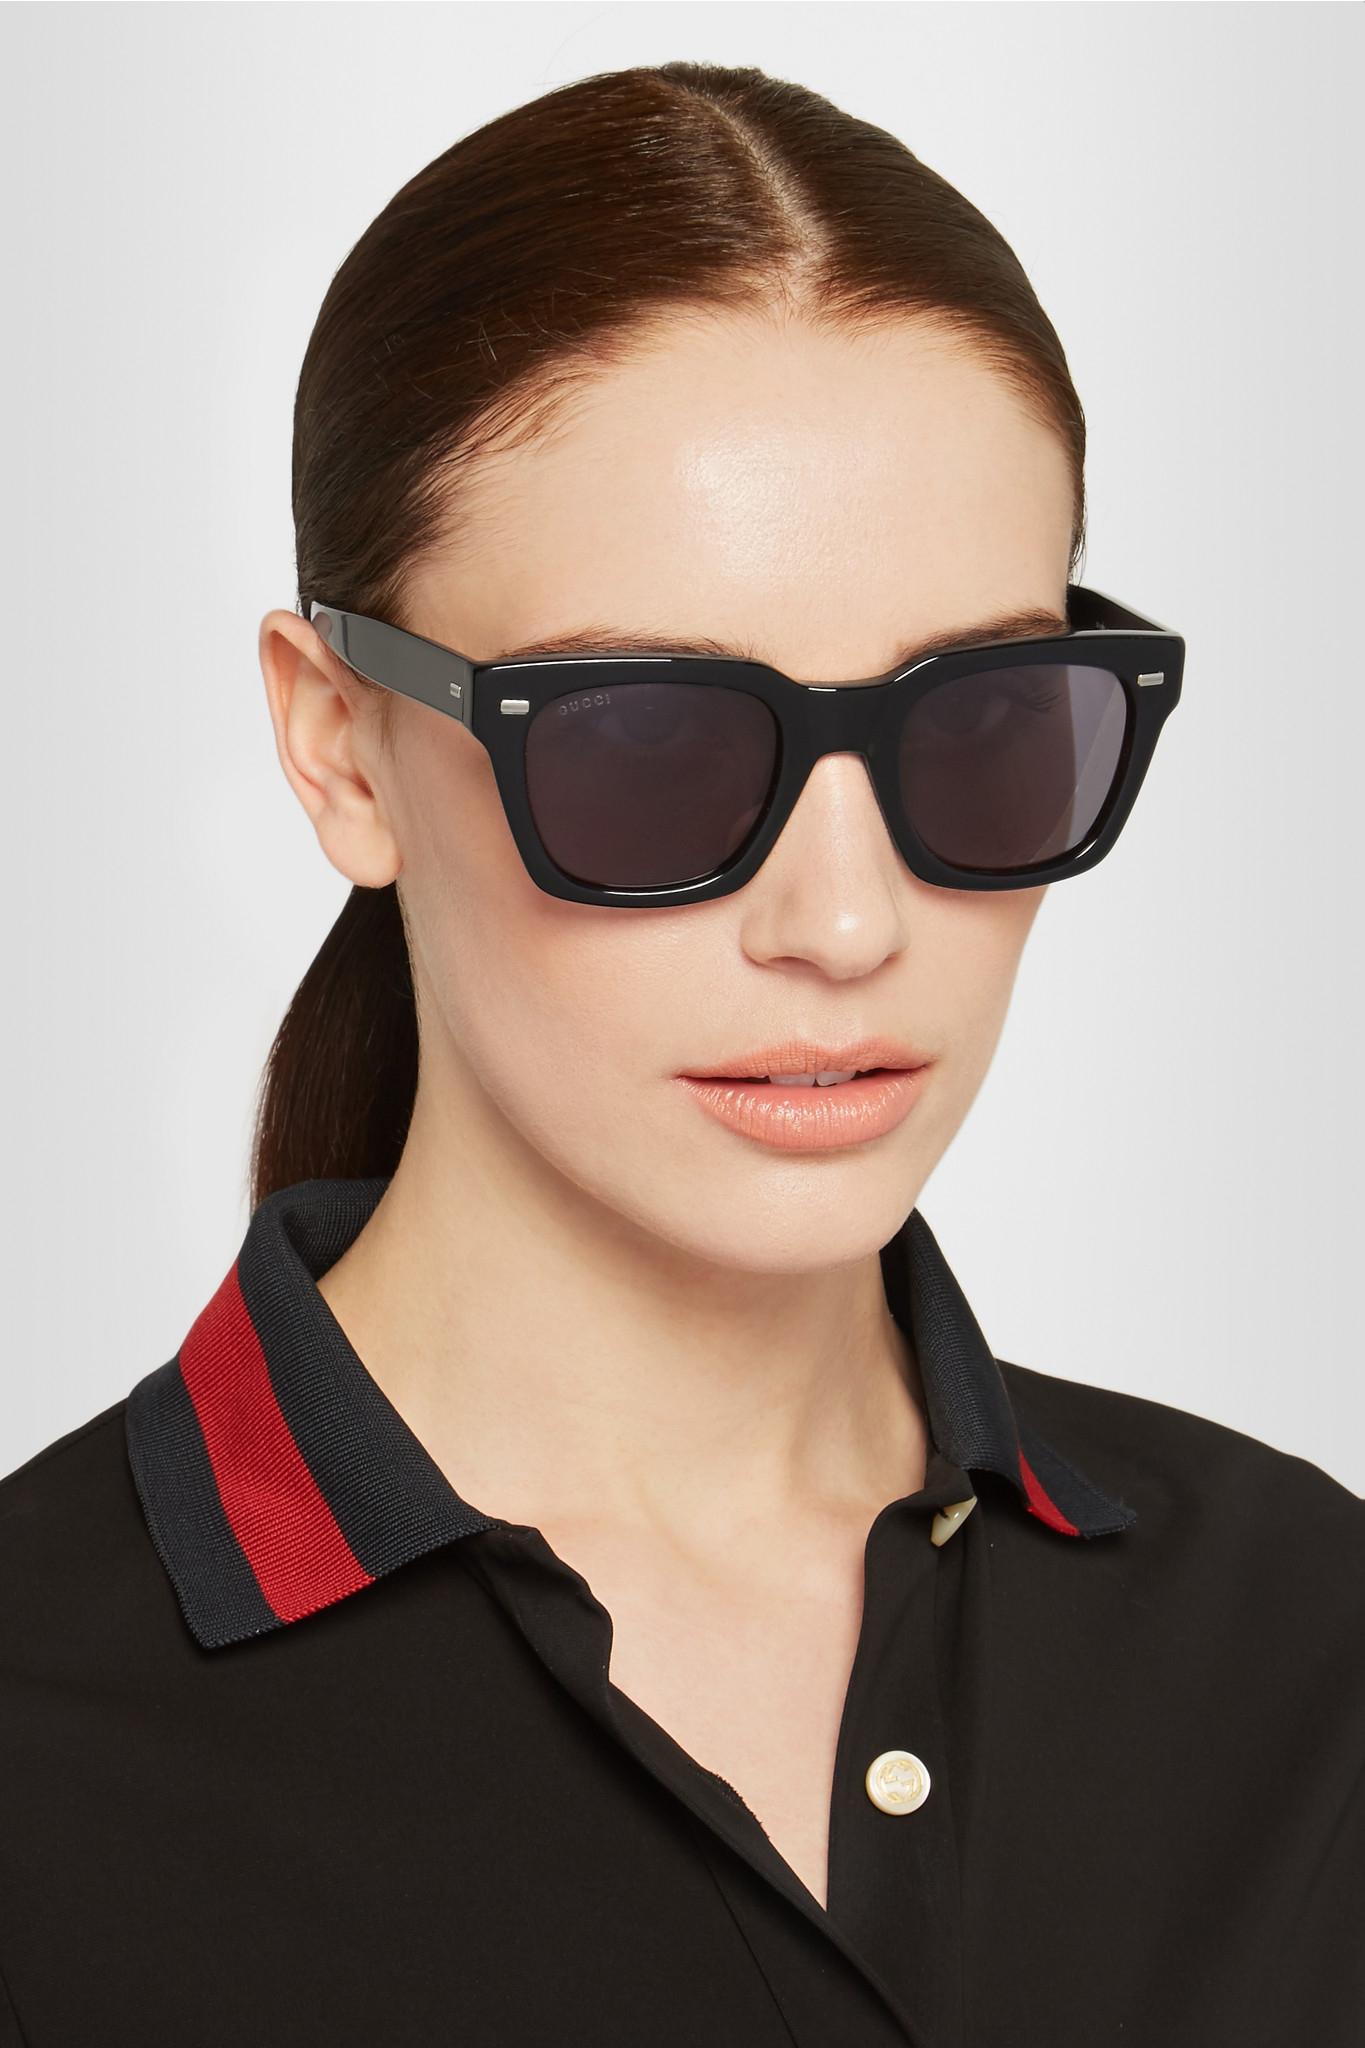 c87d101ddf Gucci Women s Oversized Acetate Sunglasses